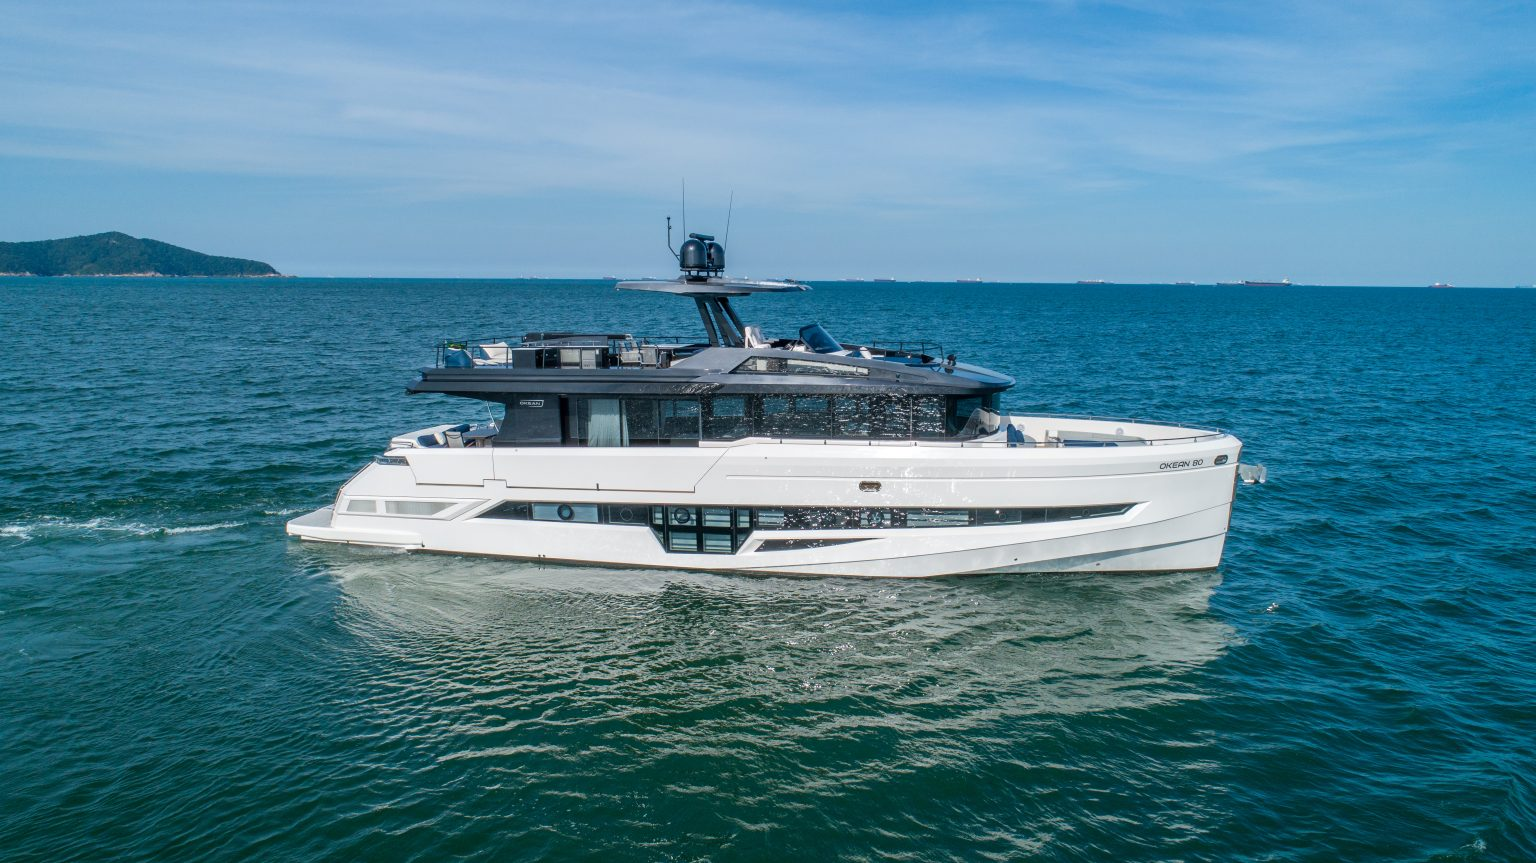 OKEAN Yachts 80' Flybridge Motor Yacht – The Queen of the OKEAN Line